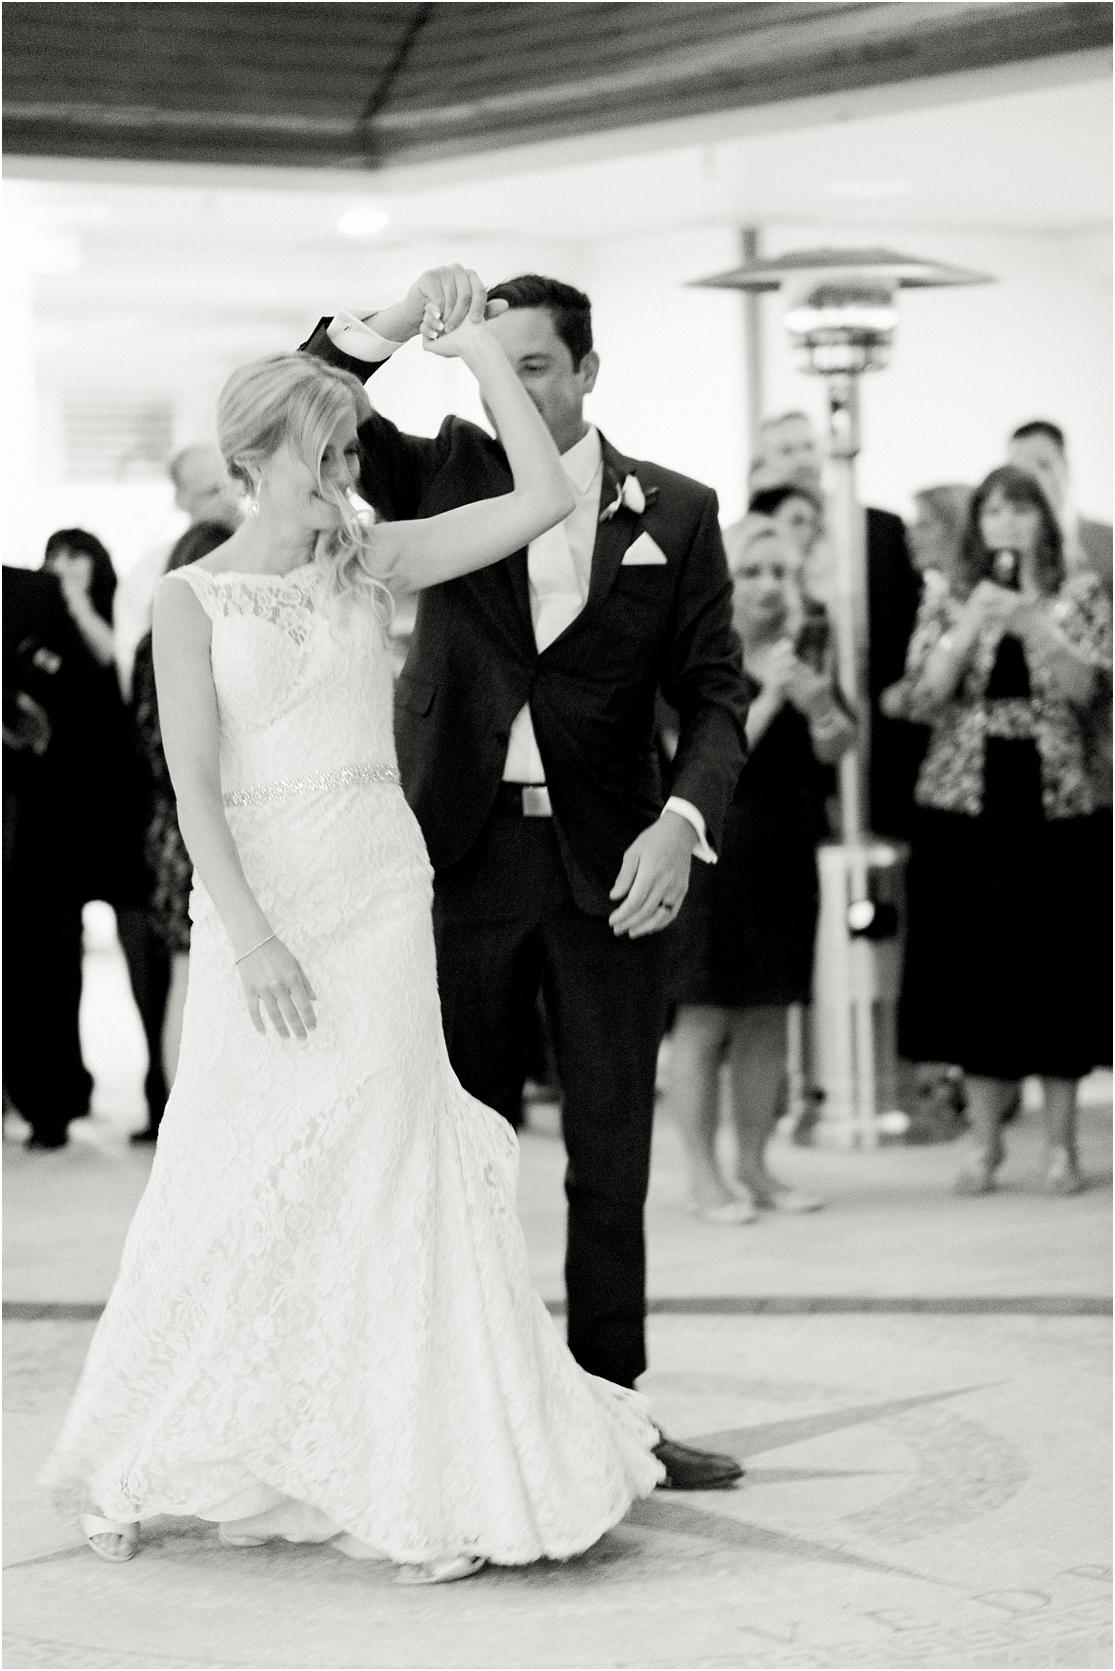 Lisa Silva Photography- Ponte Vedra Beach and Jacksonville, Florida Fine Art Film Wedding Photography- Wedding at the Ponte Vedra Inn and Club_0079.jpg